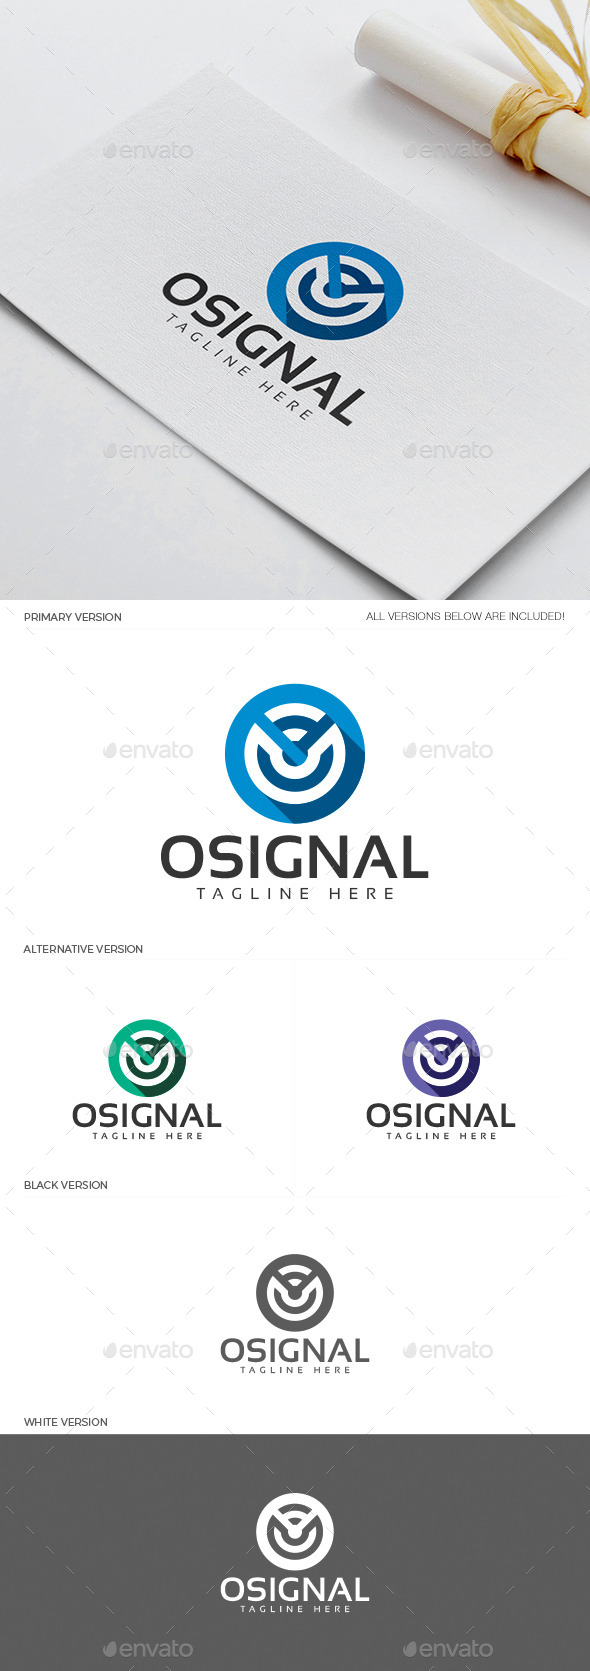 Osignal Logo